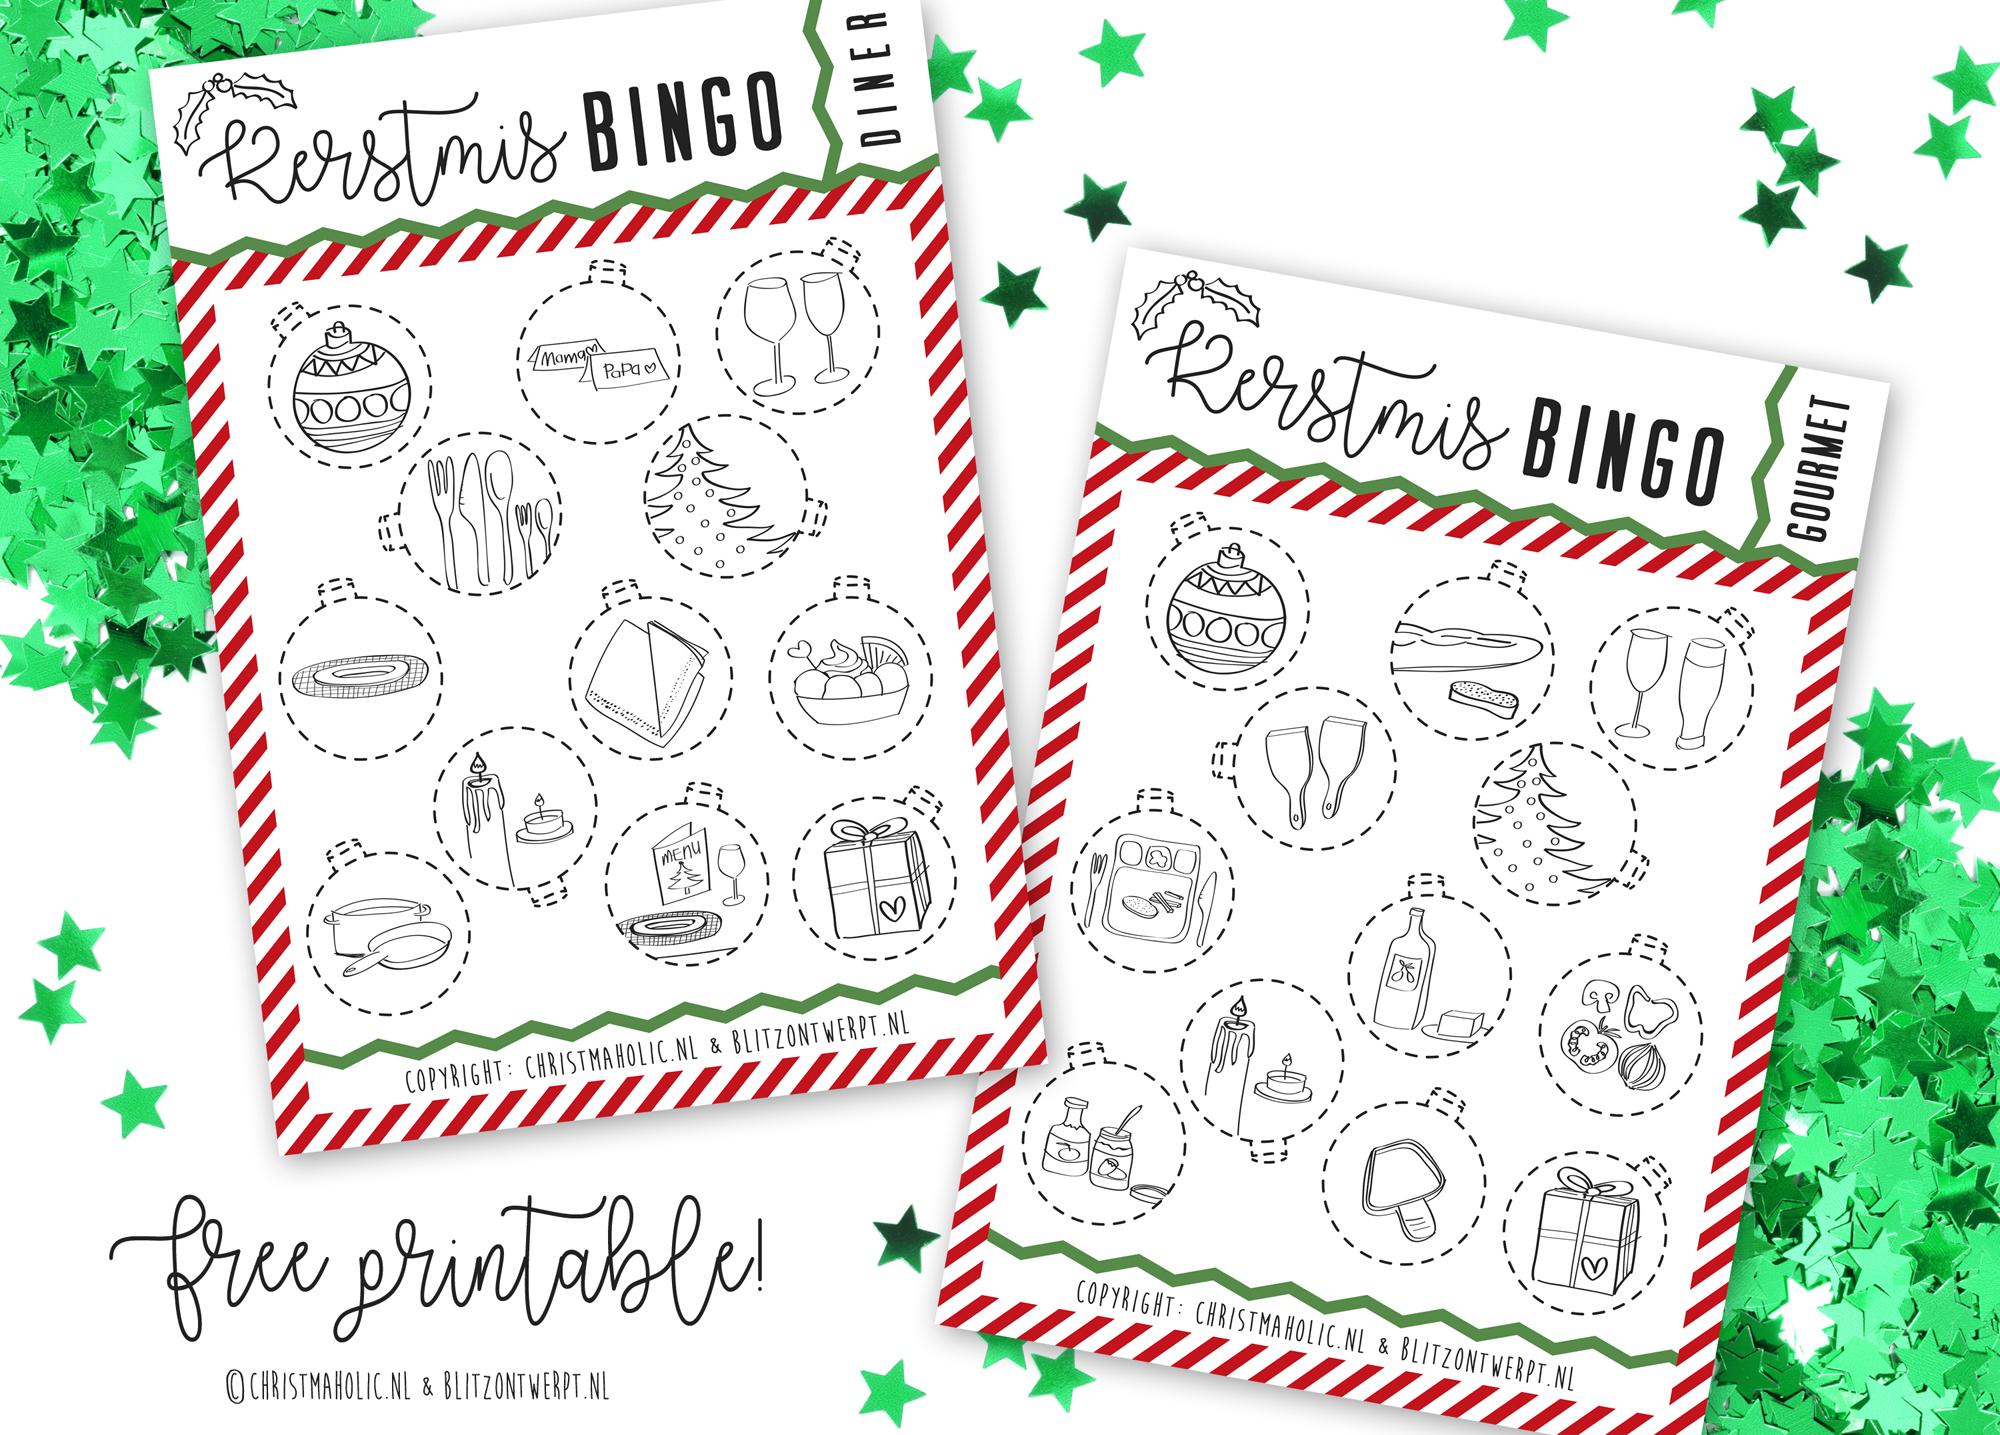 Christmaholic Blitz Ontwerpt Free Printable Kerstbingo